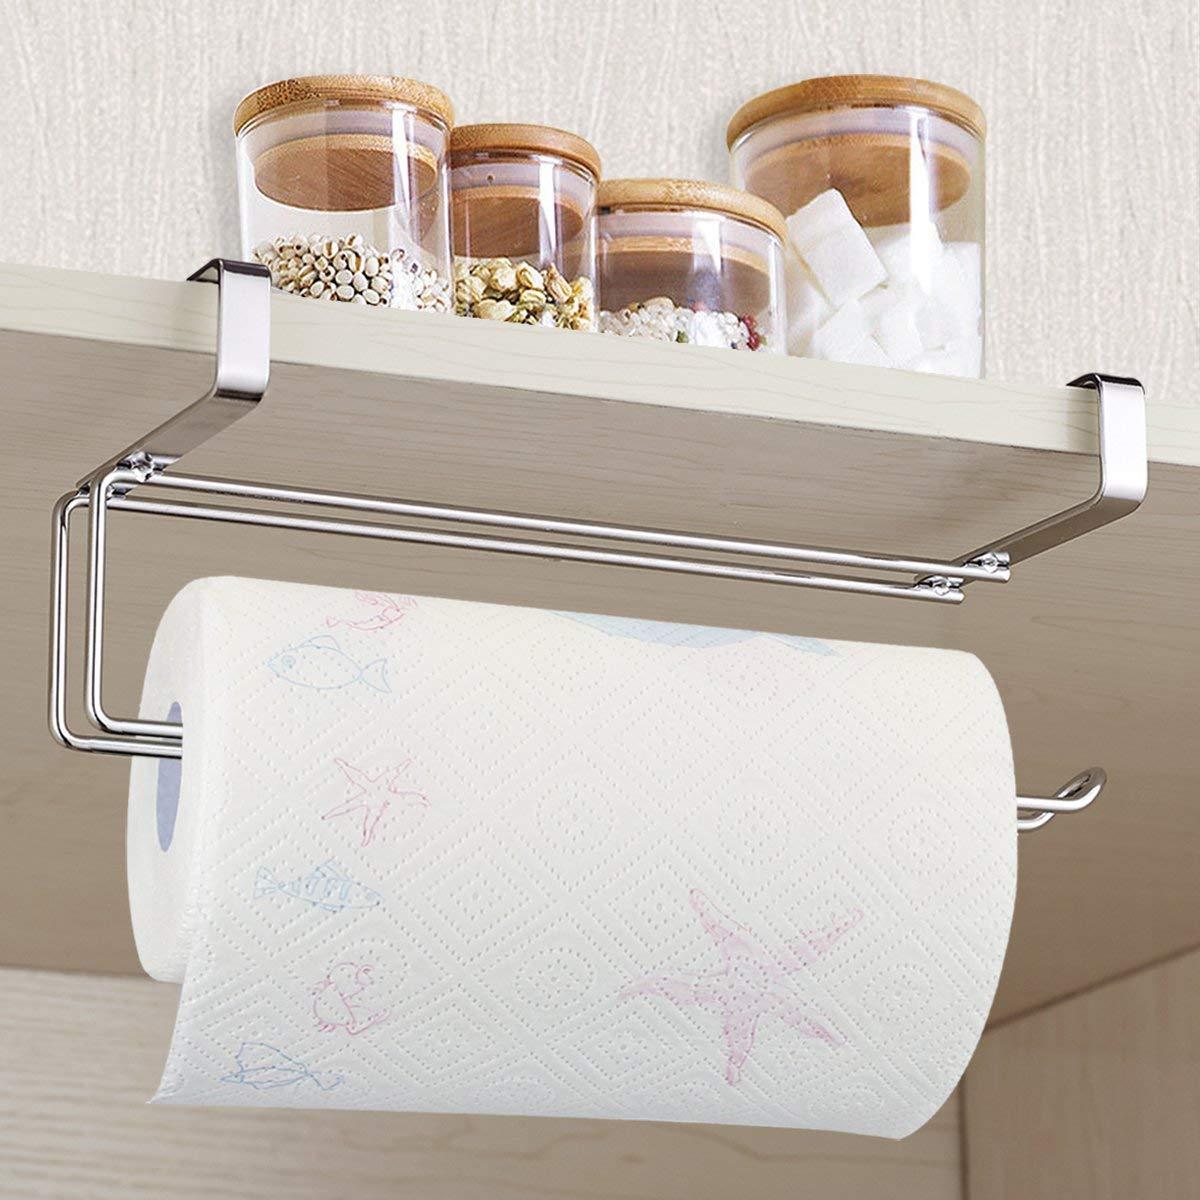 Paper Towel Holder Aiduy Hanging Paper Towel Holder Under Cabinet Paper Towel Rack Hanger Over The Door Kitchen Roll Holder